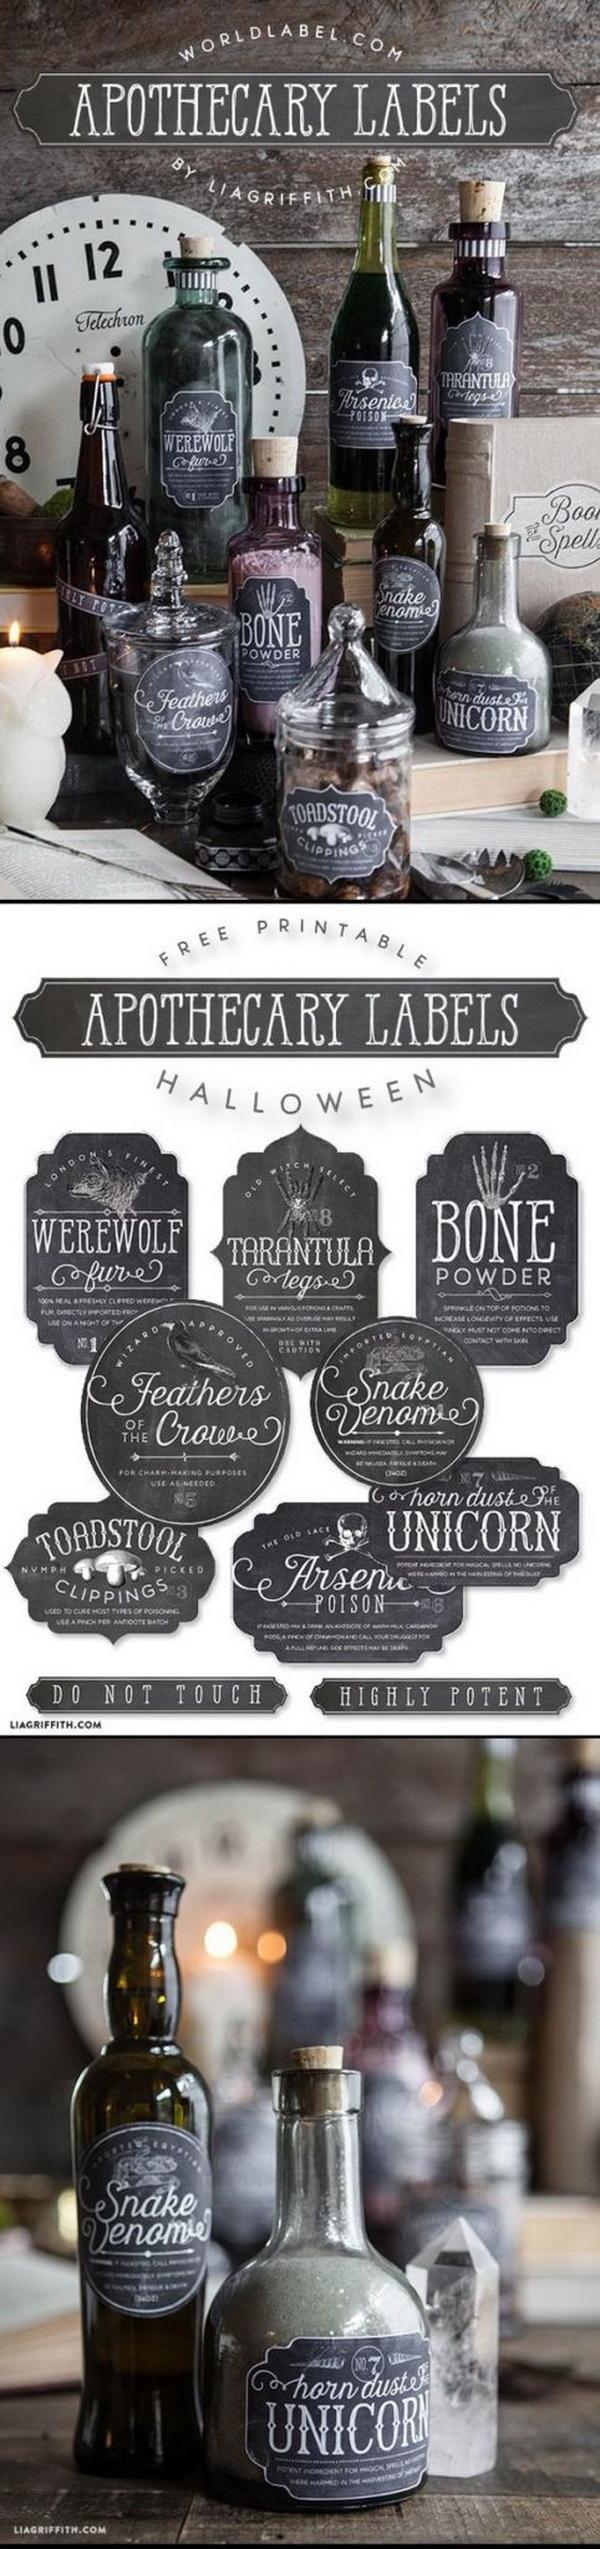 Halloween Bottles Decorations.